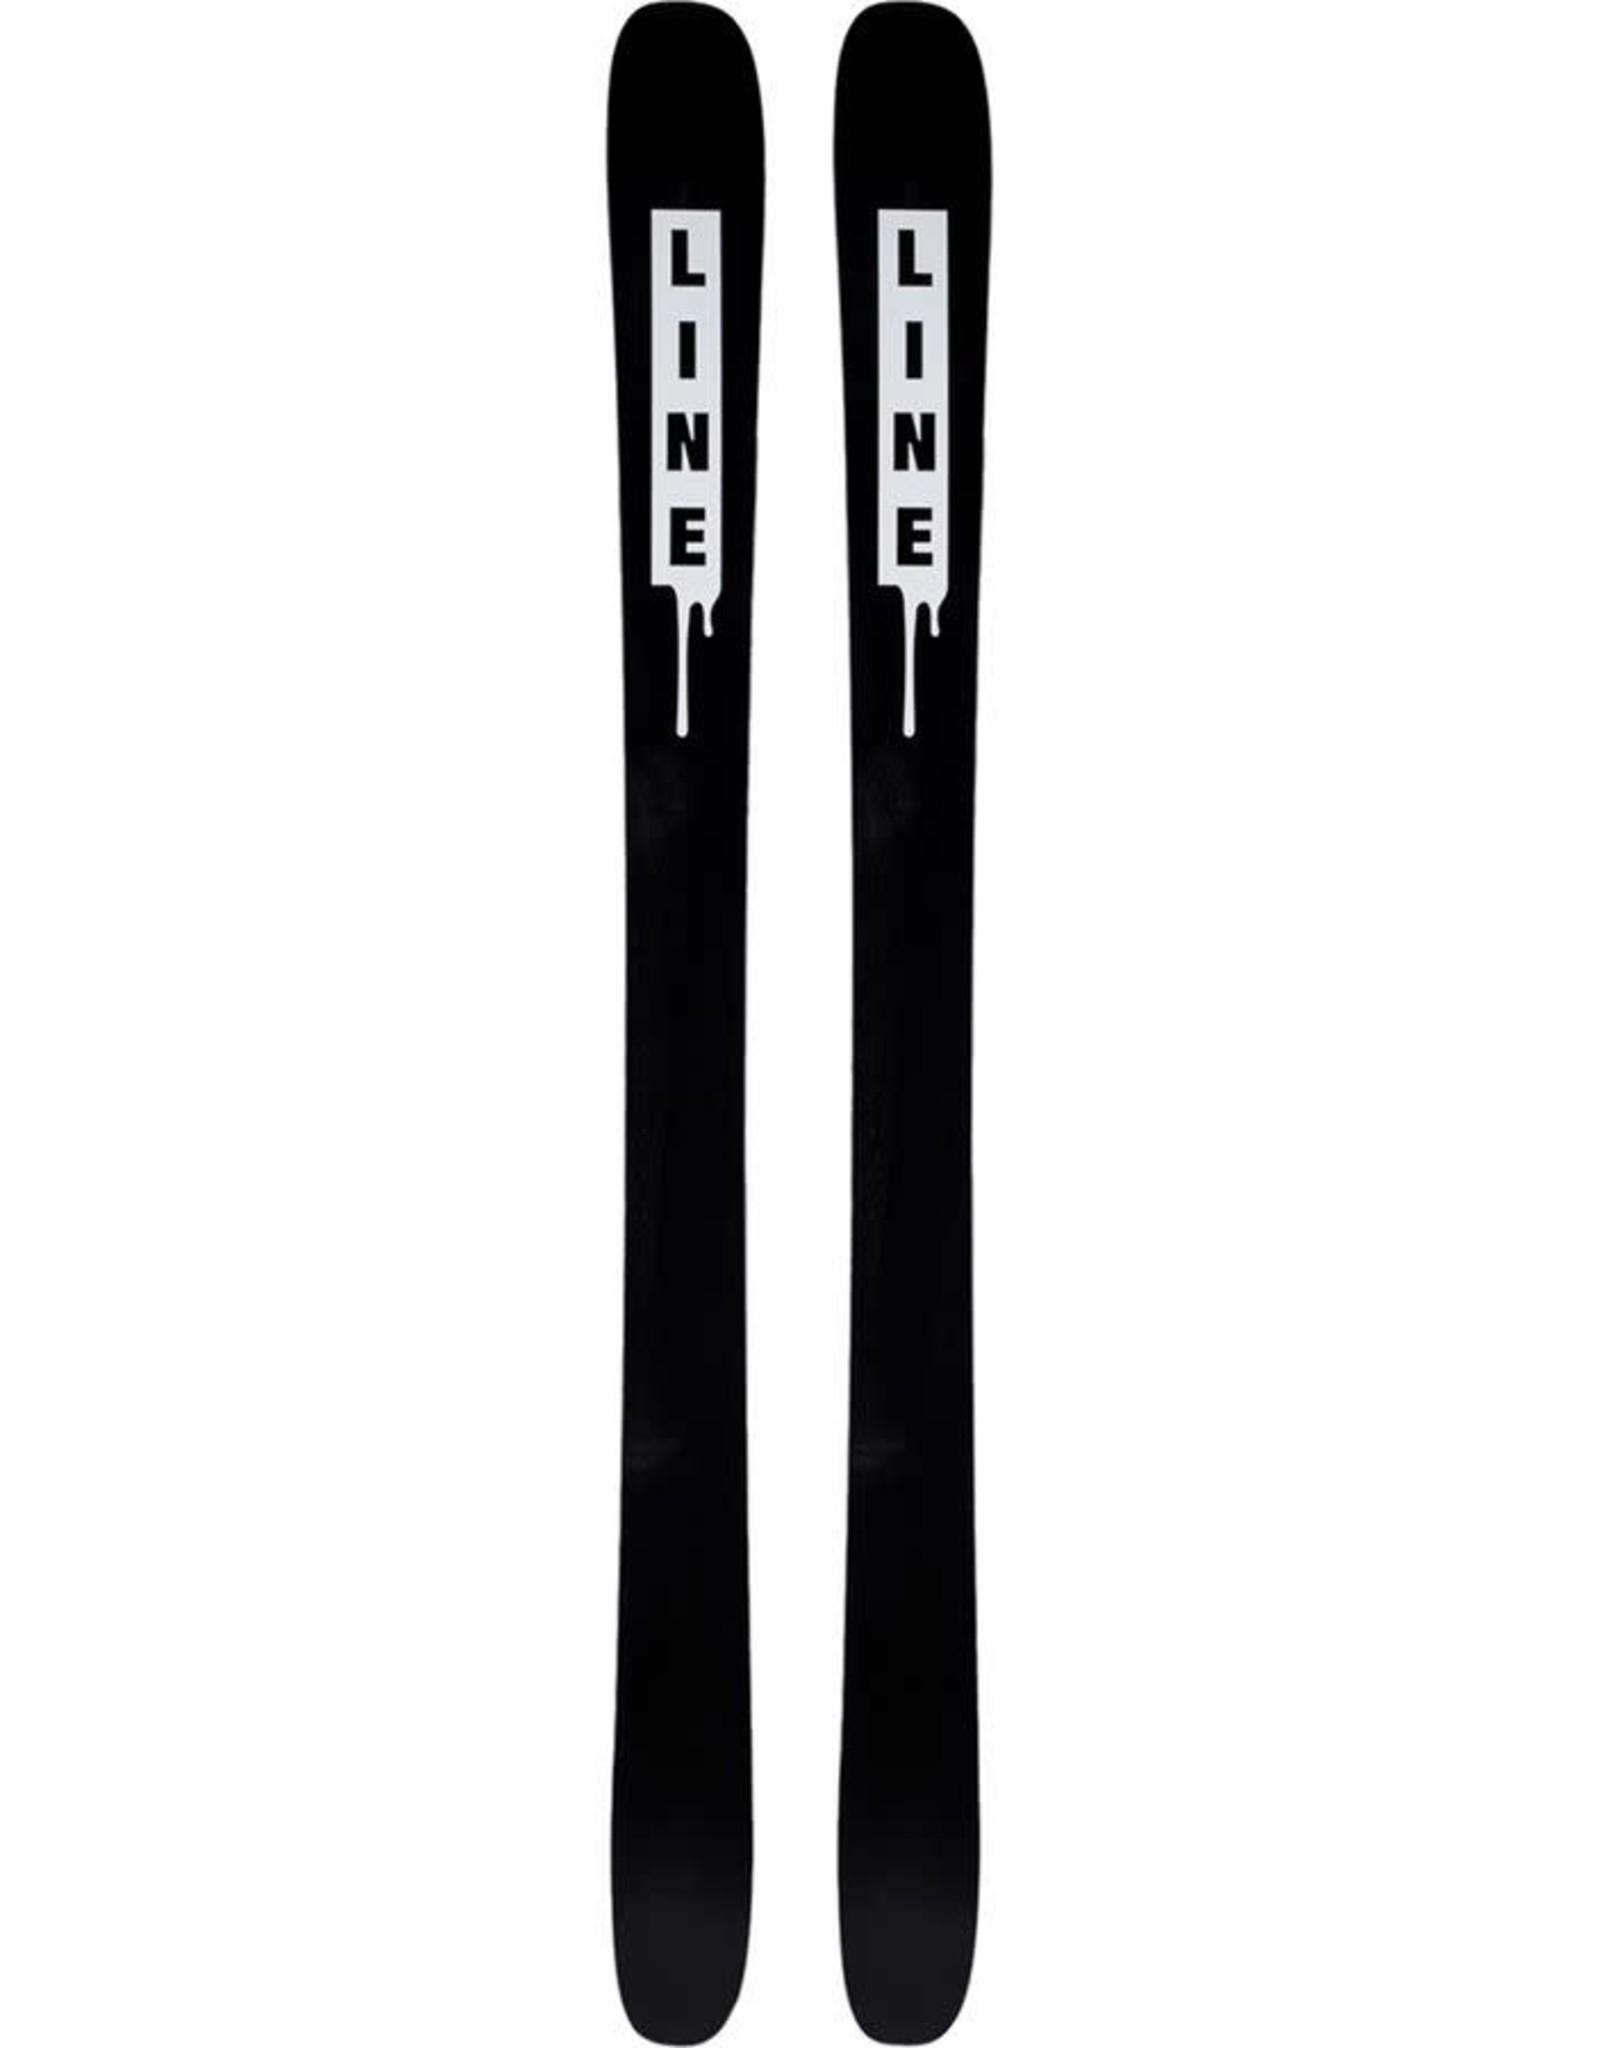 LINE Skis LINE Skis VISION 108 (19/20)